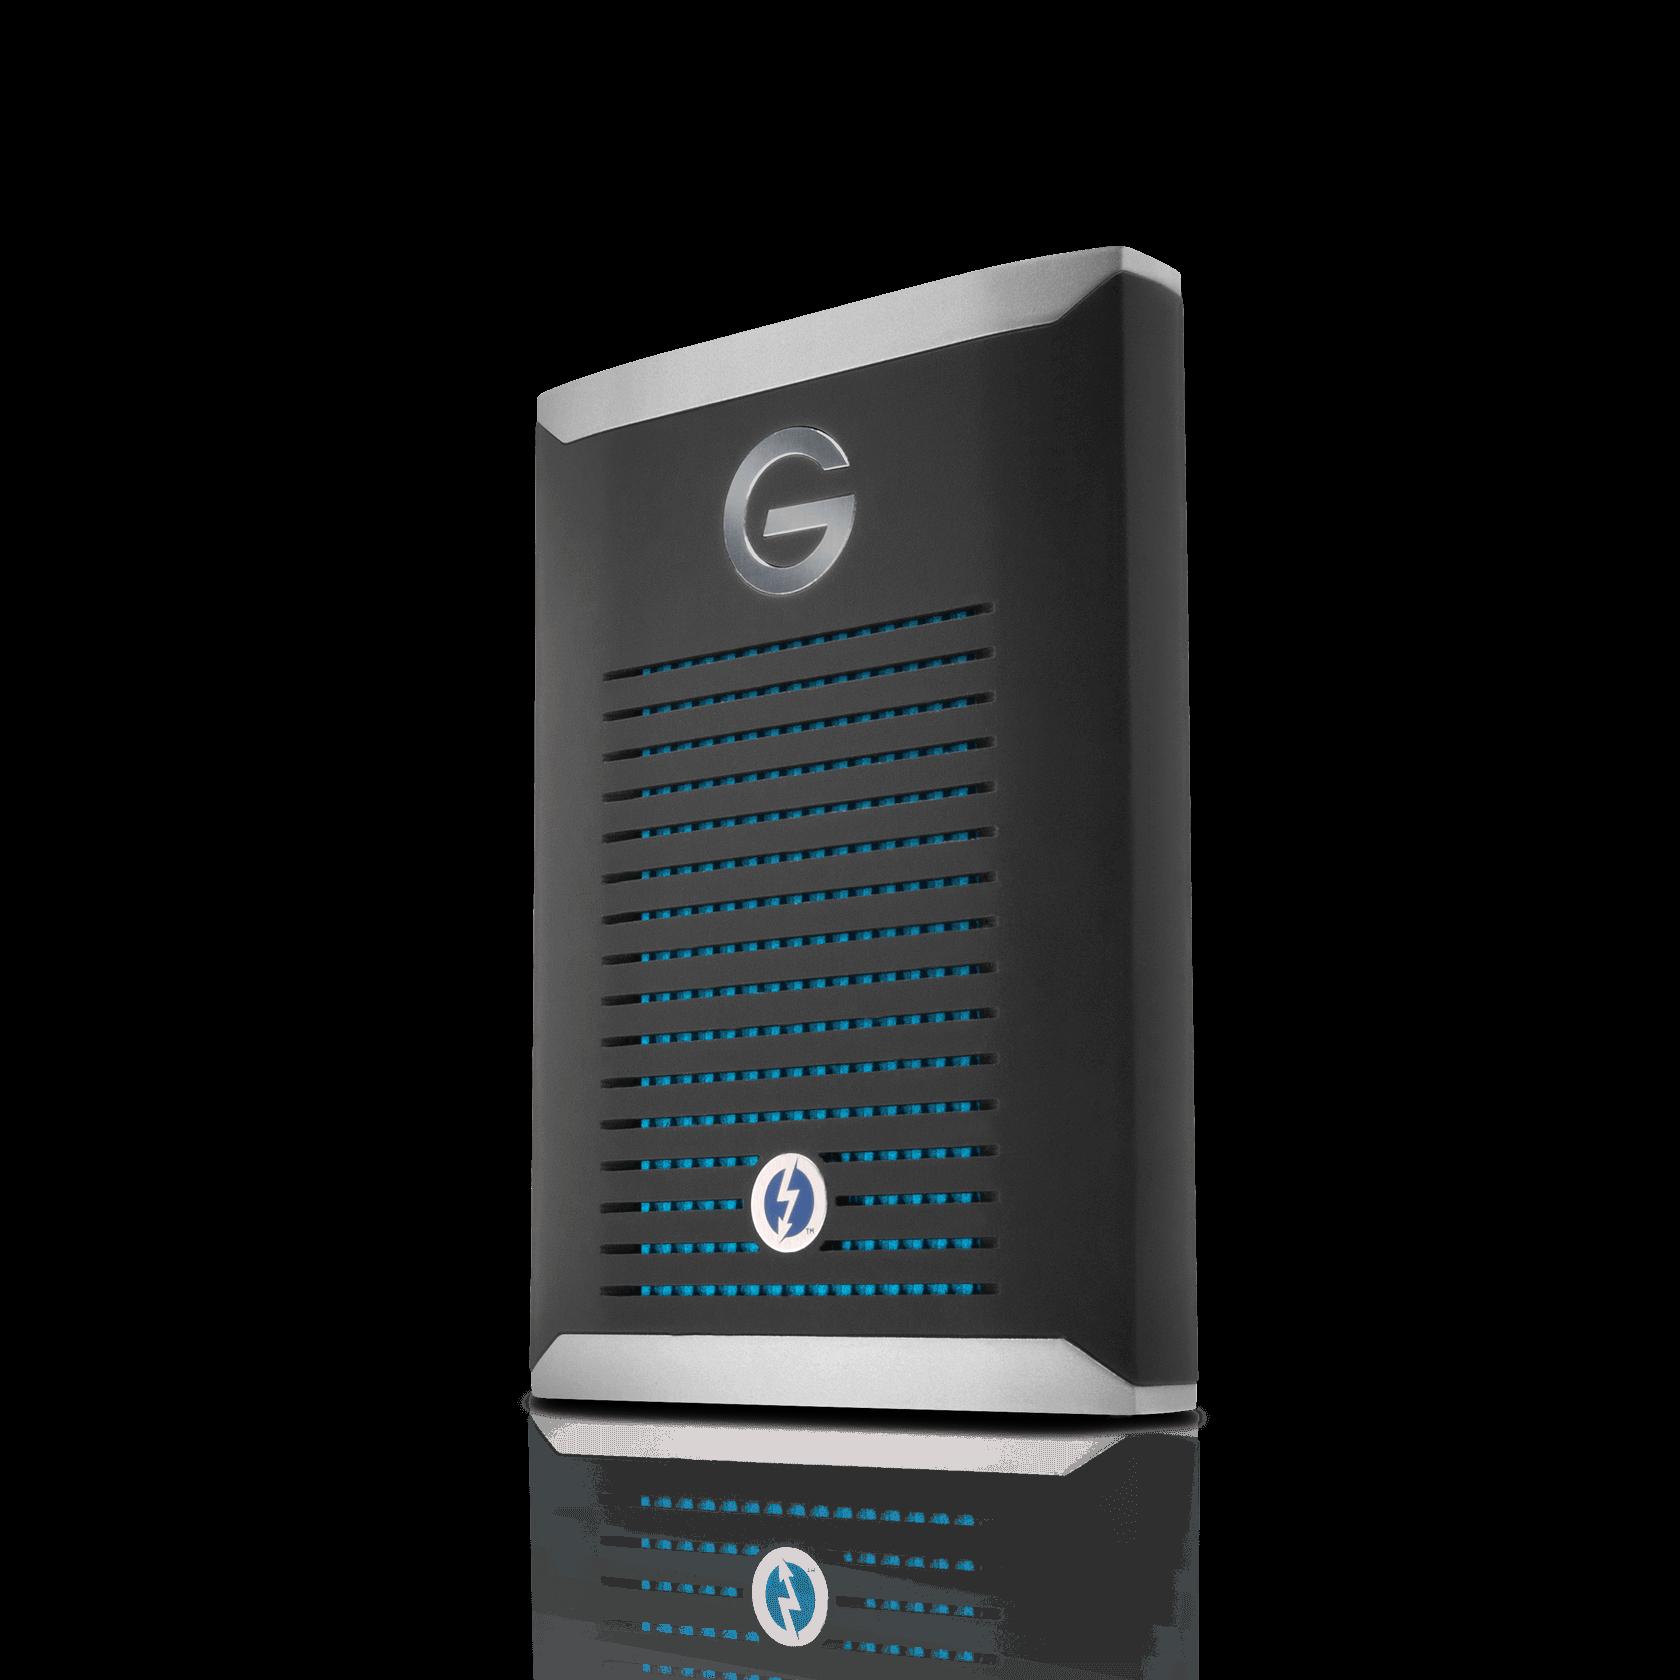 WesternDigital coupon: G-Technology G-DRIVE Mobile Pro Thunderbolt 3 500GB - 0G10310-1